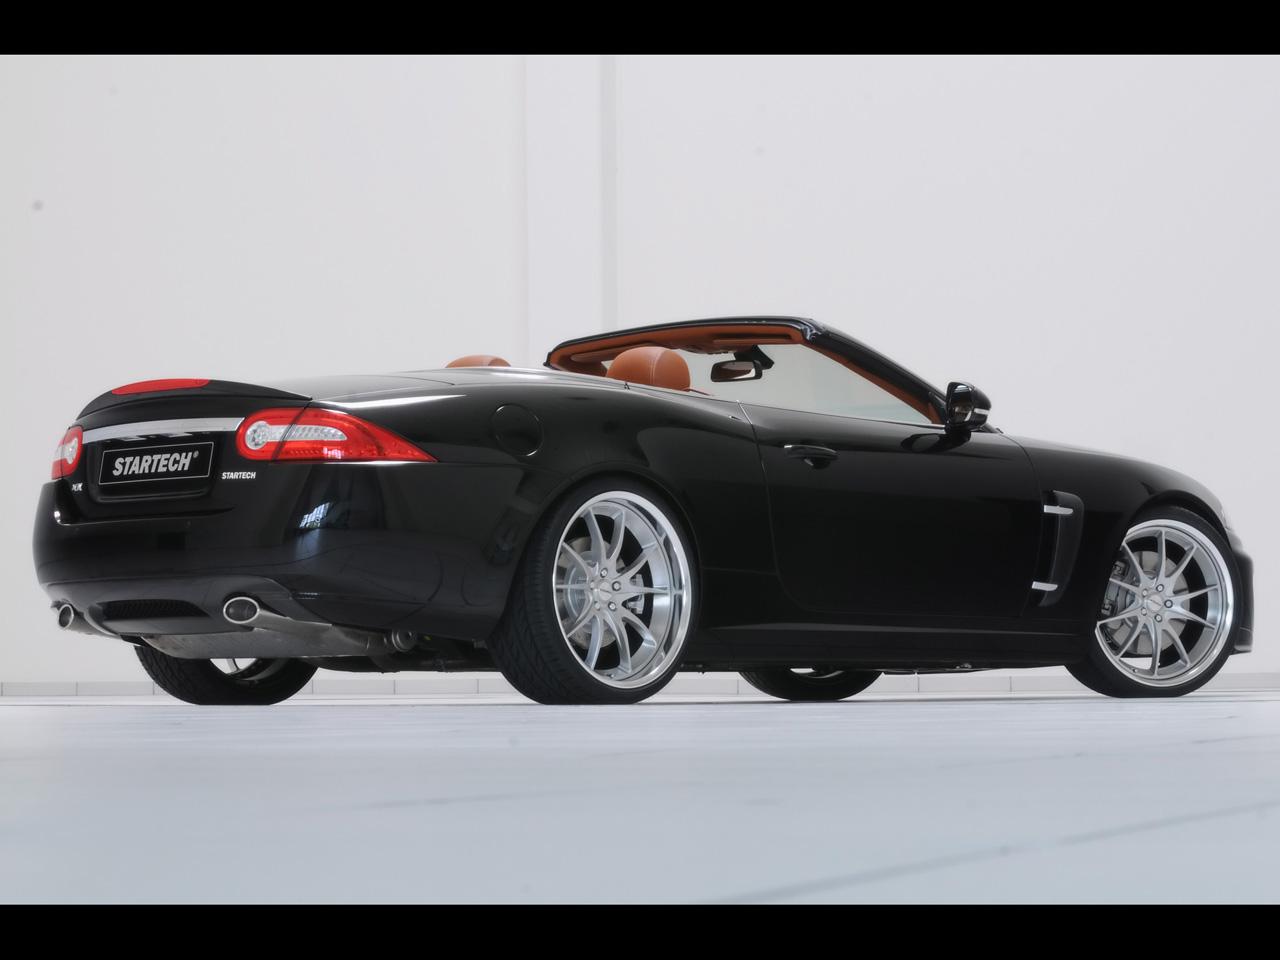 Jaguar Xk Cabrio Tuning 1280x960 Wallpaper Teahub Io